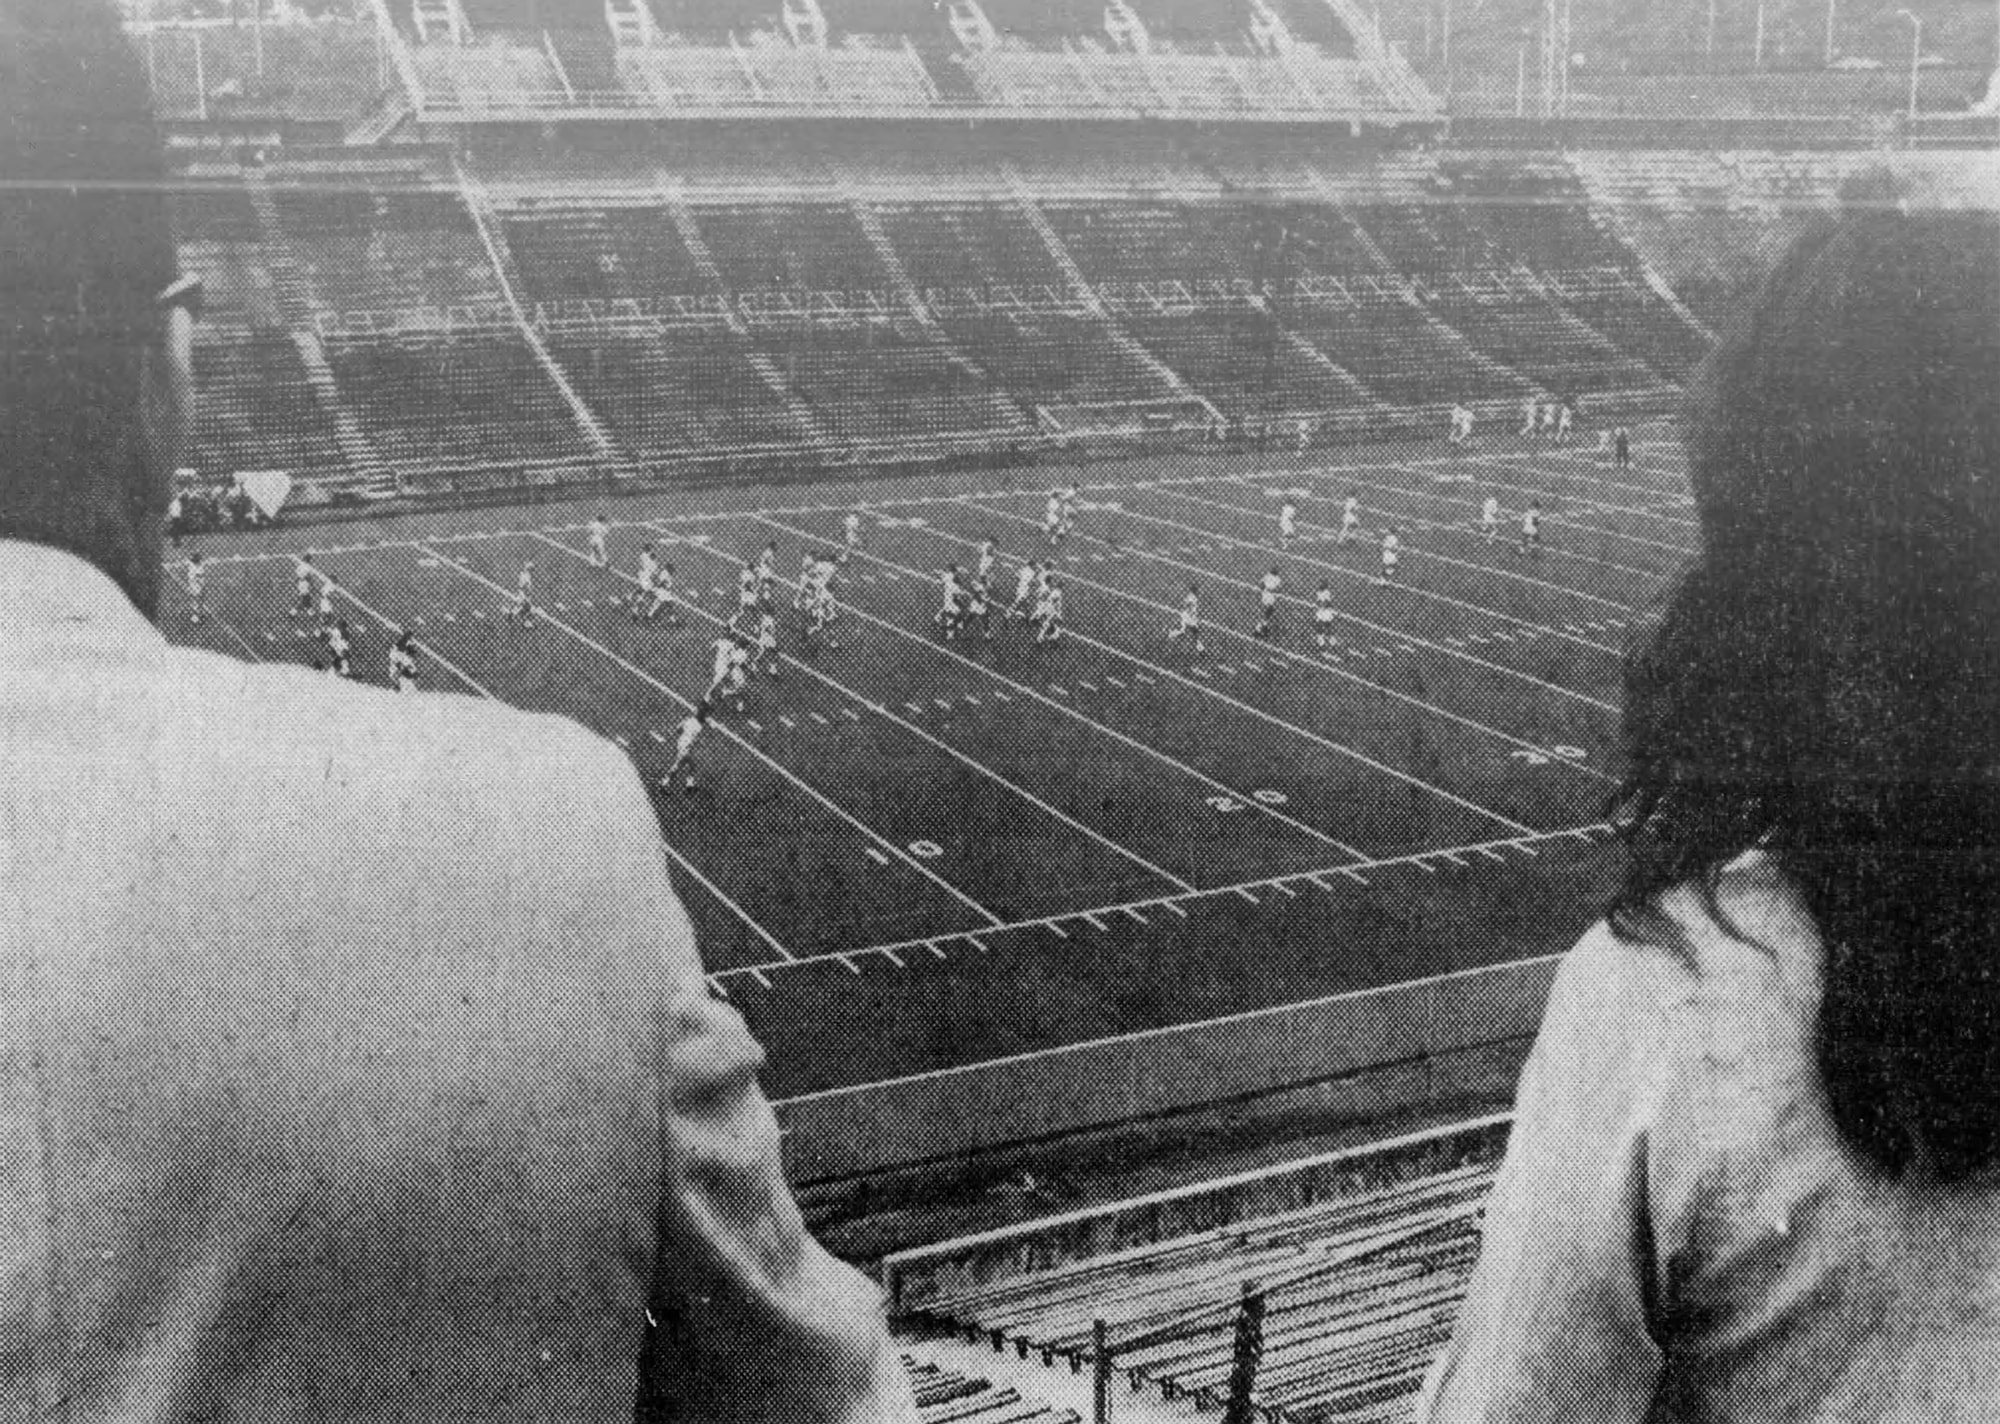 The Bearcats practice on Nippert Stadium's new AstroTurf, September 1970. [Enquirer]